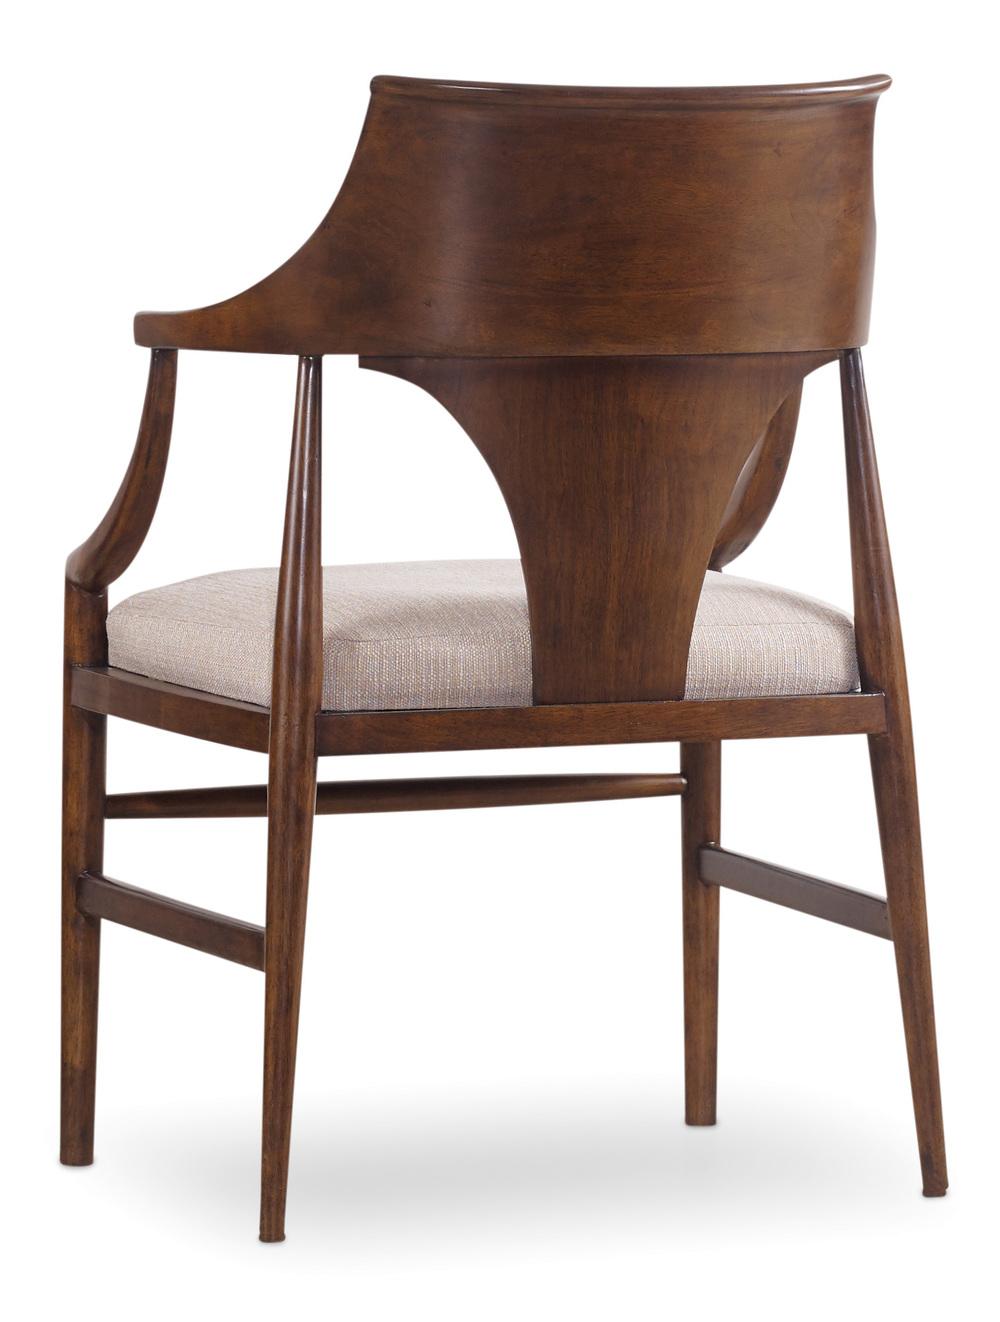 Hooker Furniture - Studio 7H Jens Danish Arm Chair